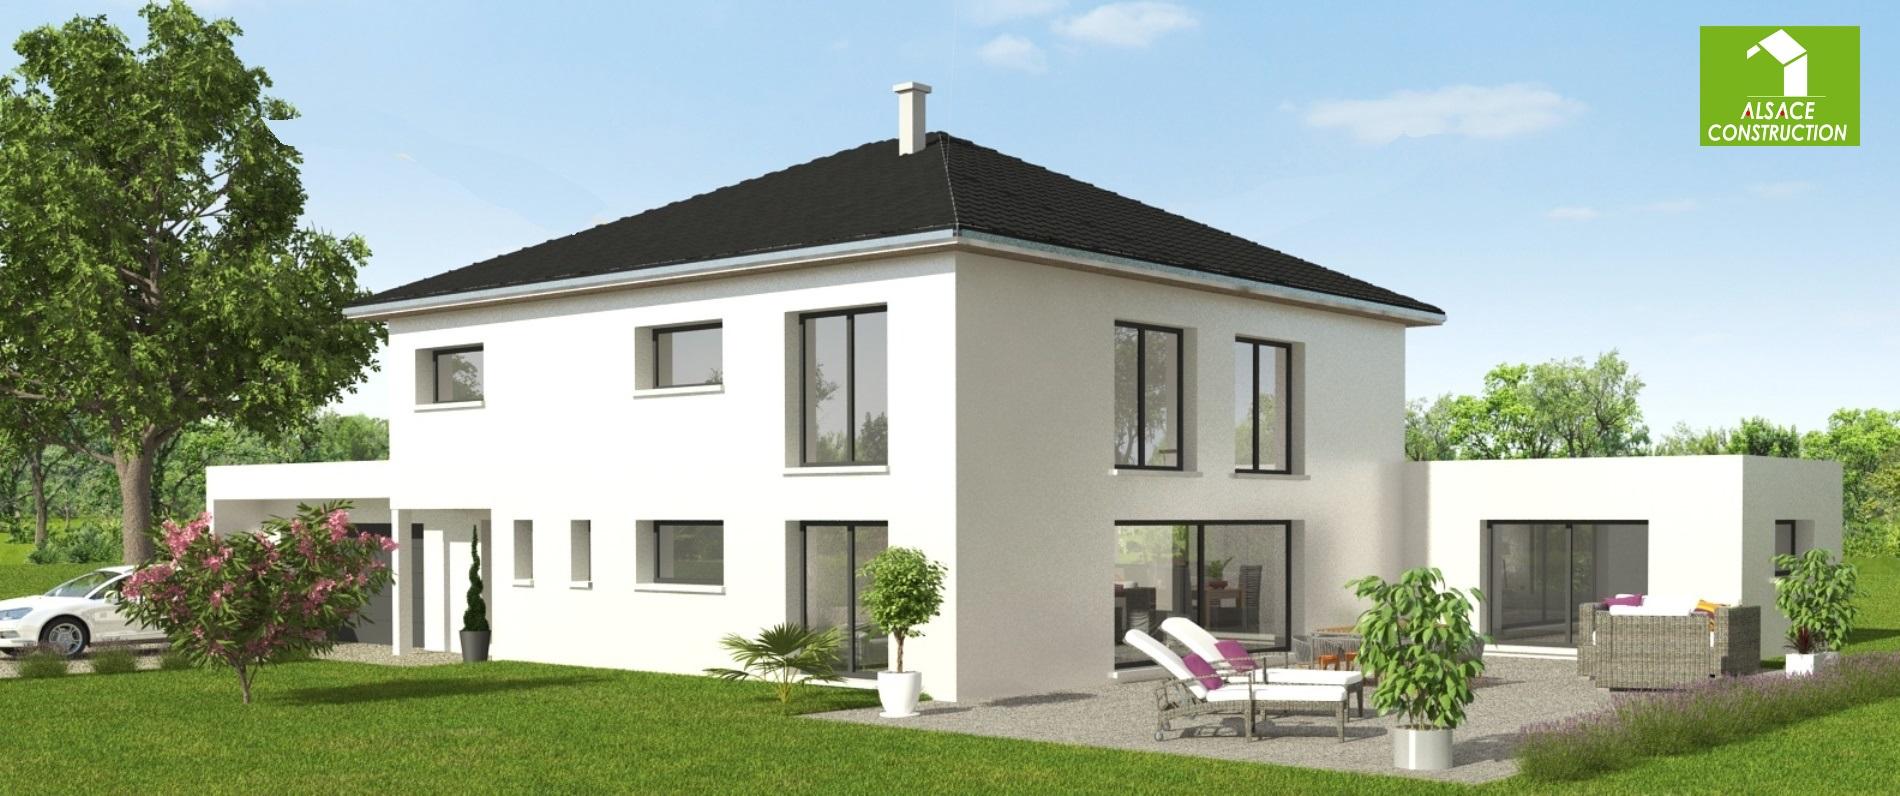 construction maison neuve haut rhin ventana blog. Black Bedroom Furniture Sets. Home Design Ideas